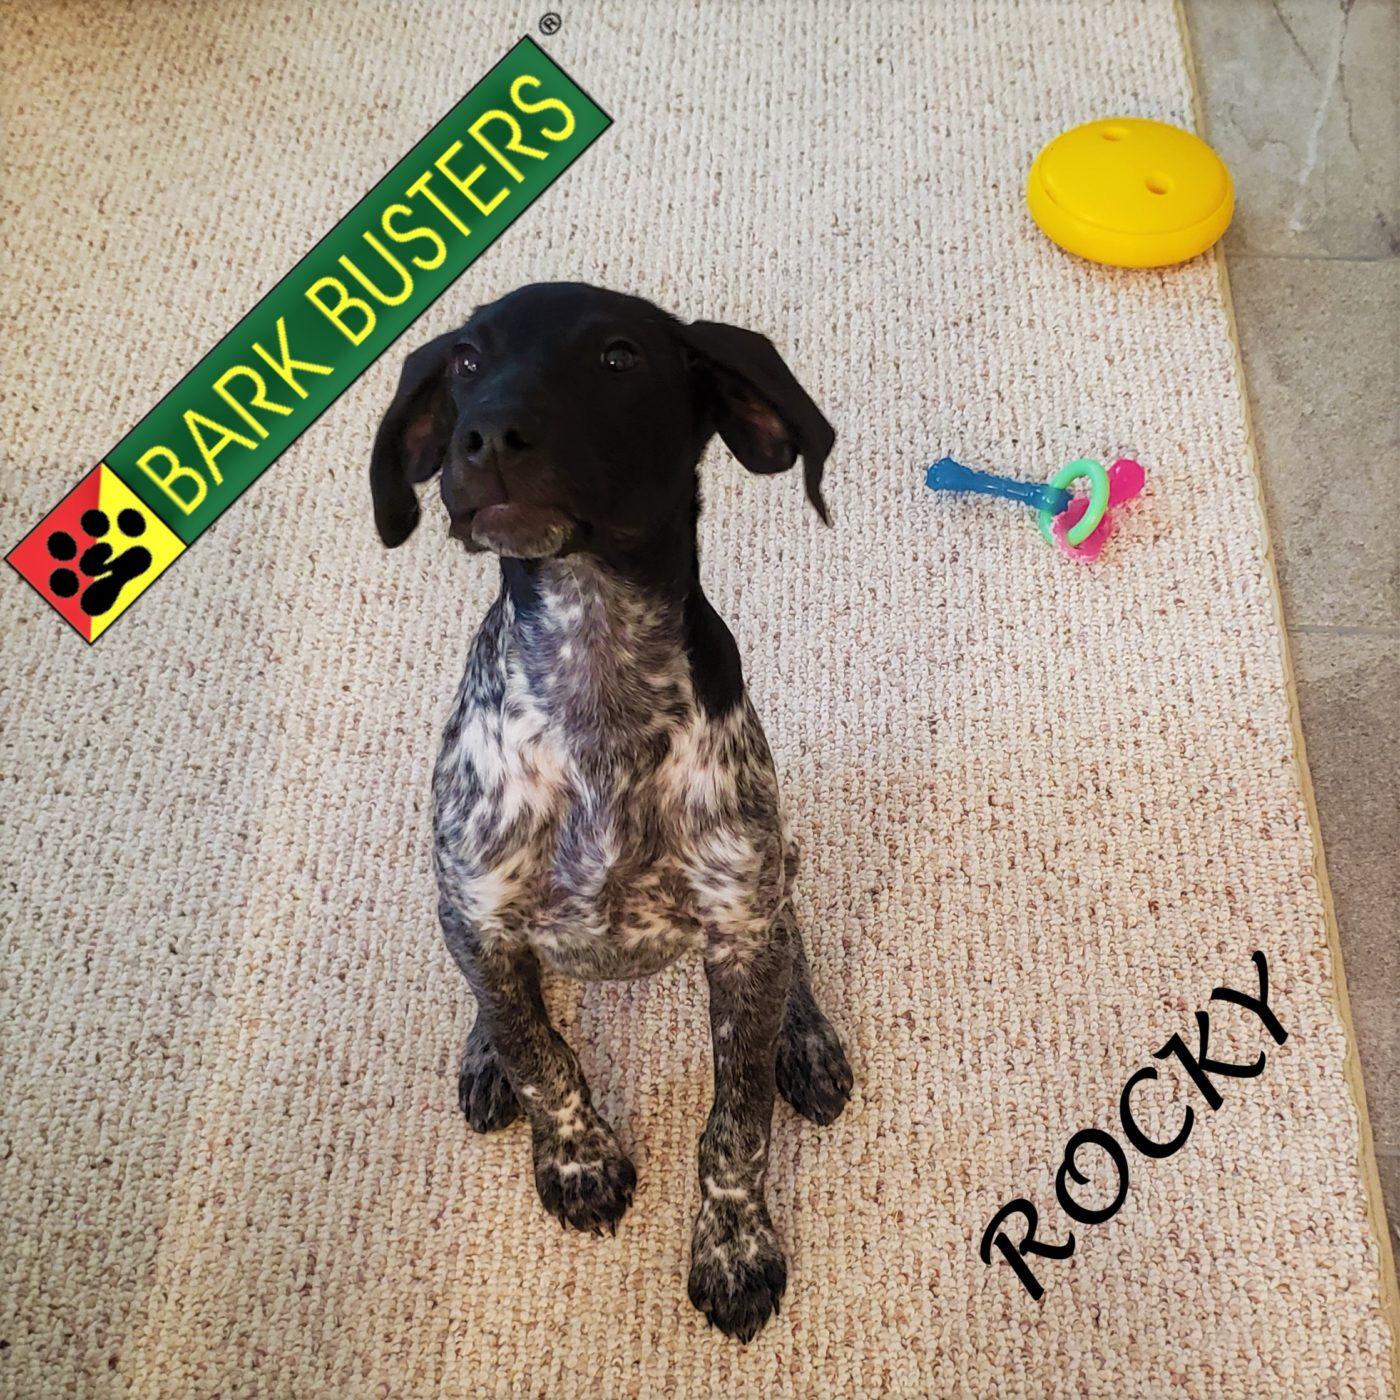 #germanshorthairedpointer #gsp #puppytraining #dogtraininglibertyhill #dogtrainernearme #gamechangertoy #barkbusters #speakdogchangeyourlife #inhomedogtraining